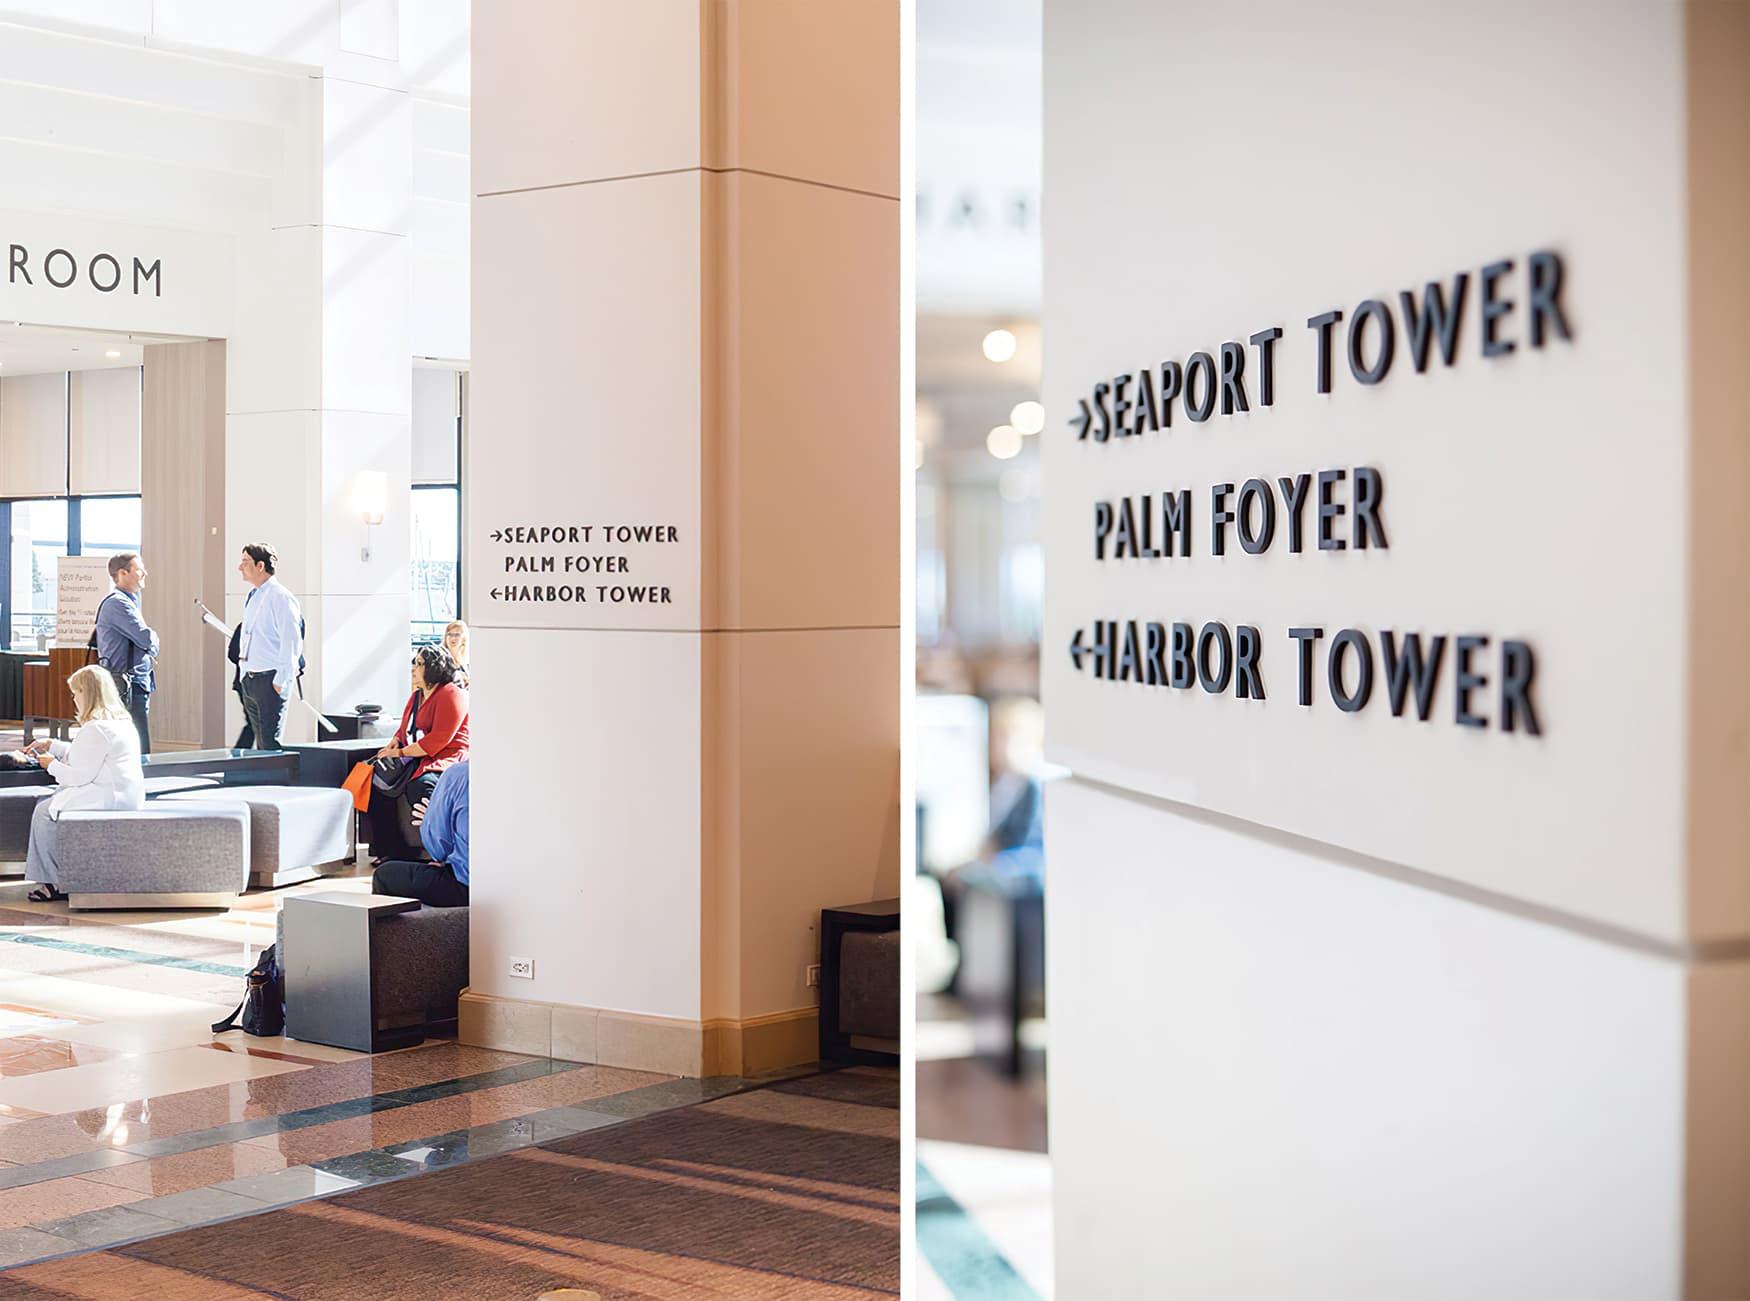 Manchester Grand Hyatt, located in San Diego, California. Hospitality Design. RSM Design prepared an interior wayfinding system.